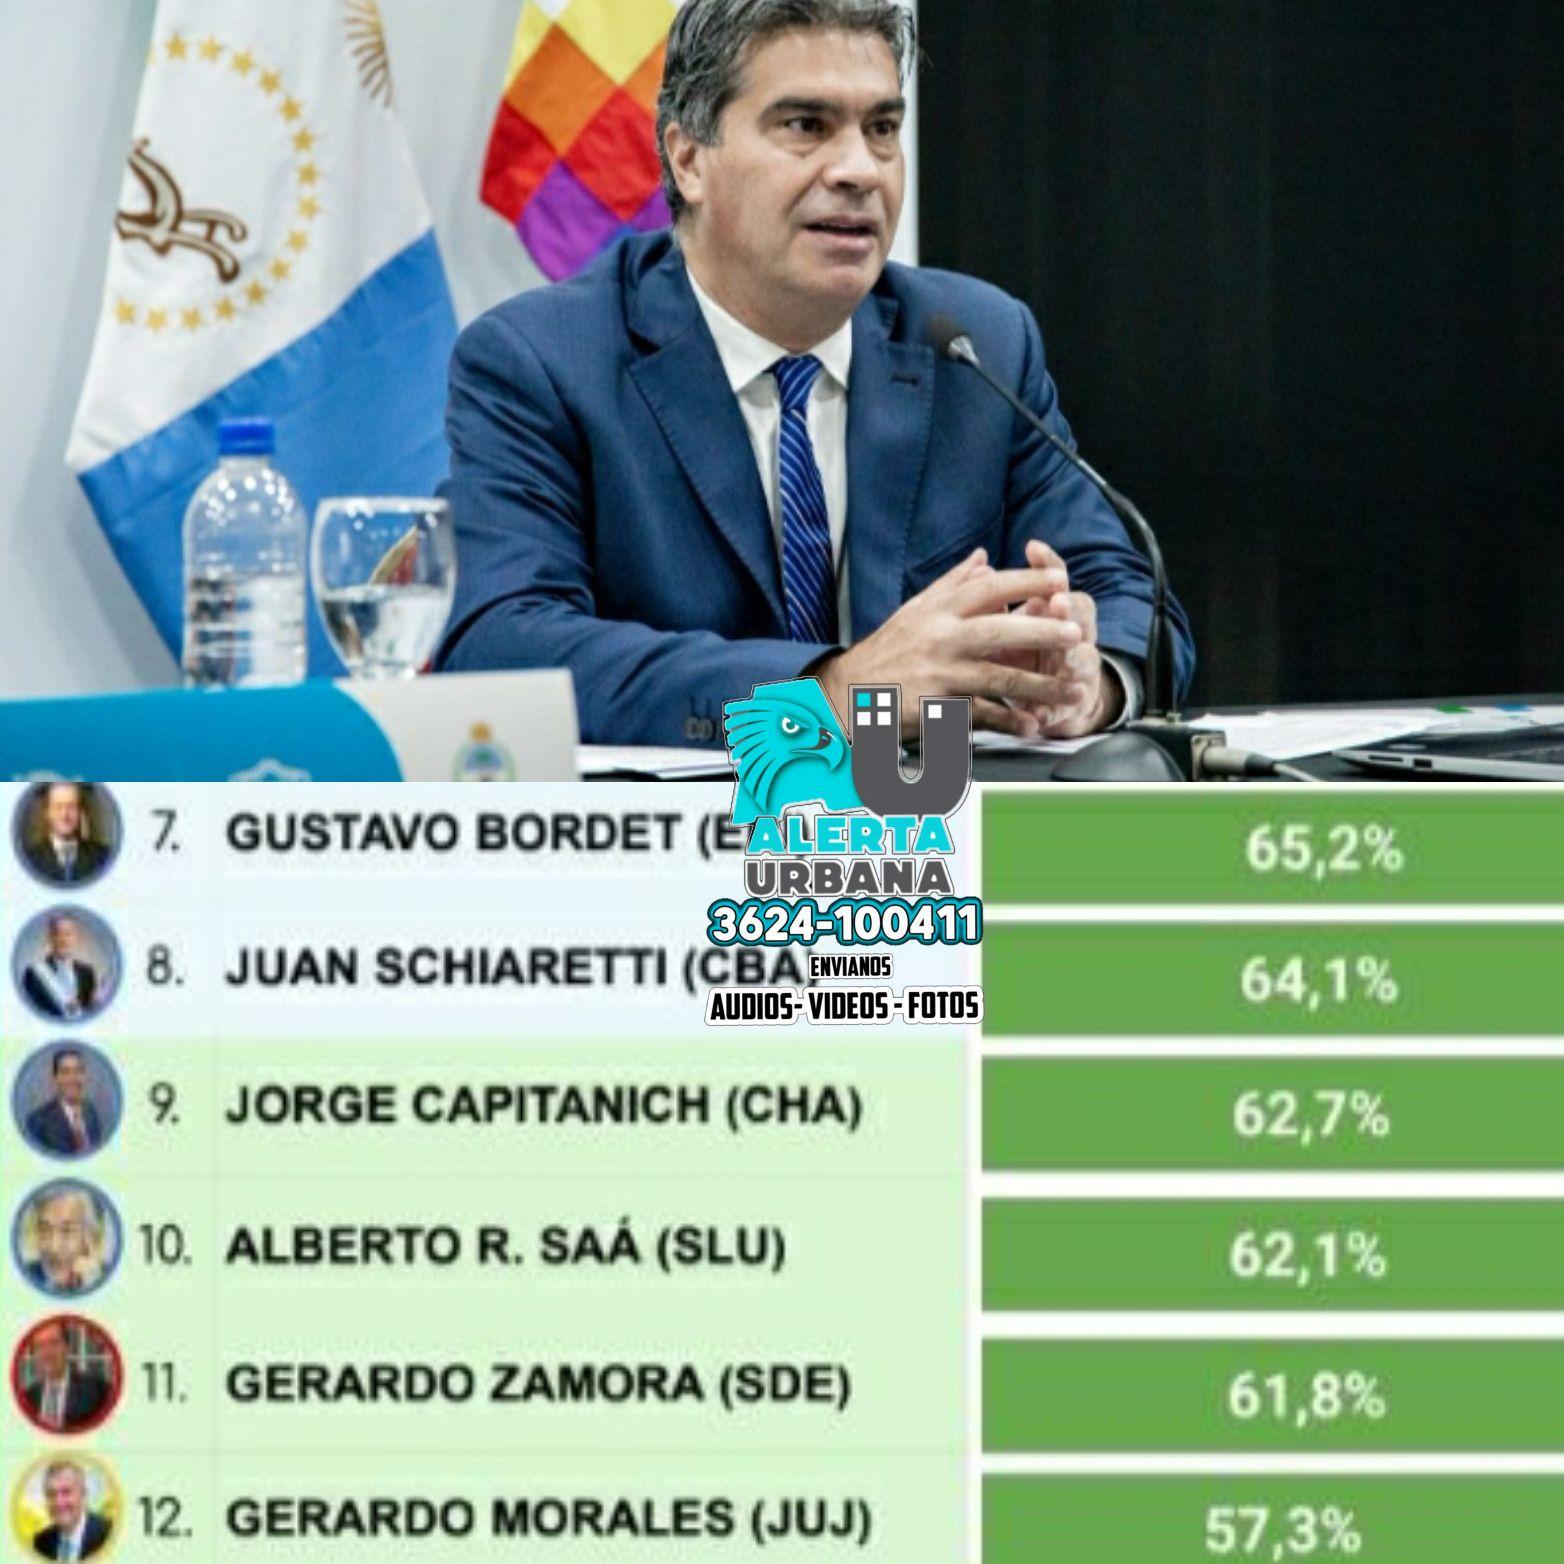 El Gobernador Jorge M. Capitanich tiene una imagen positiva del 62,7%